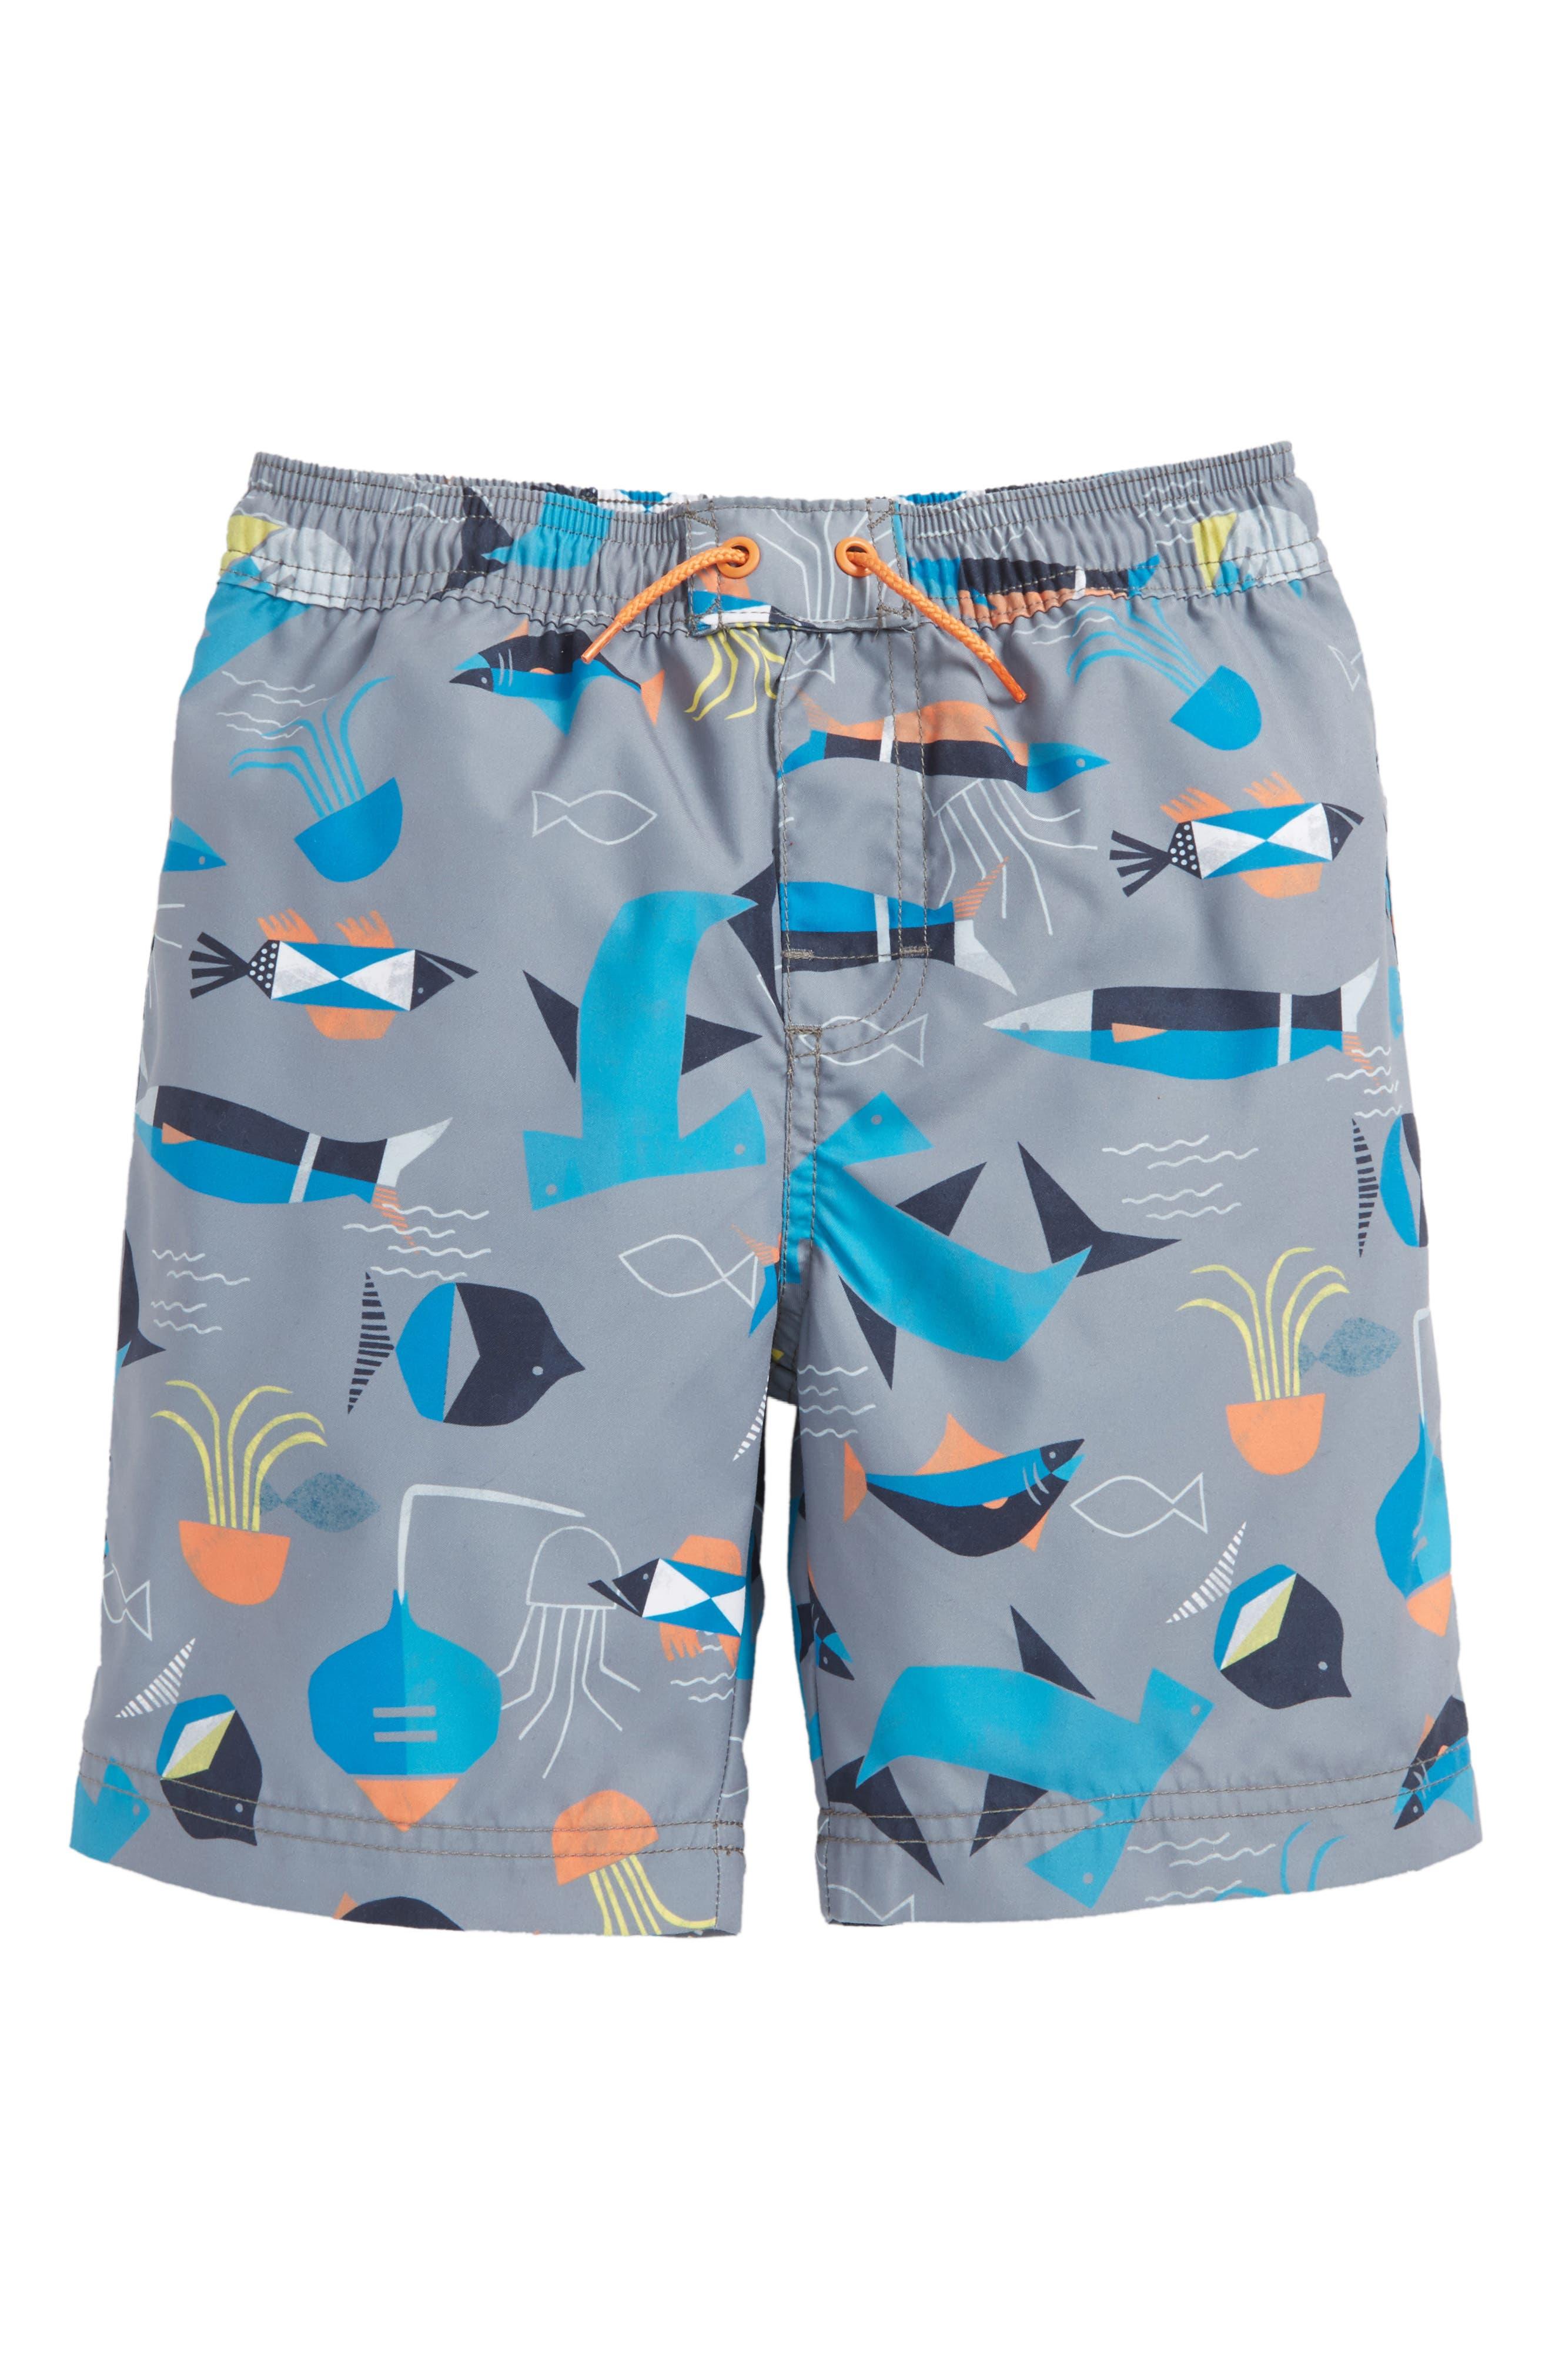 Tea Collection Salt Water Swim Trunks (Toddler Boys & Little Boys)